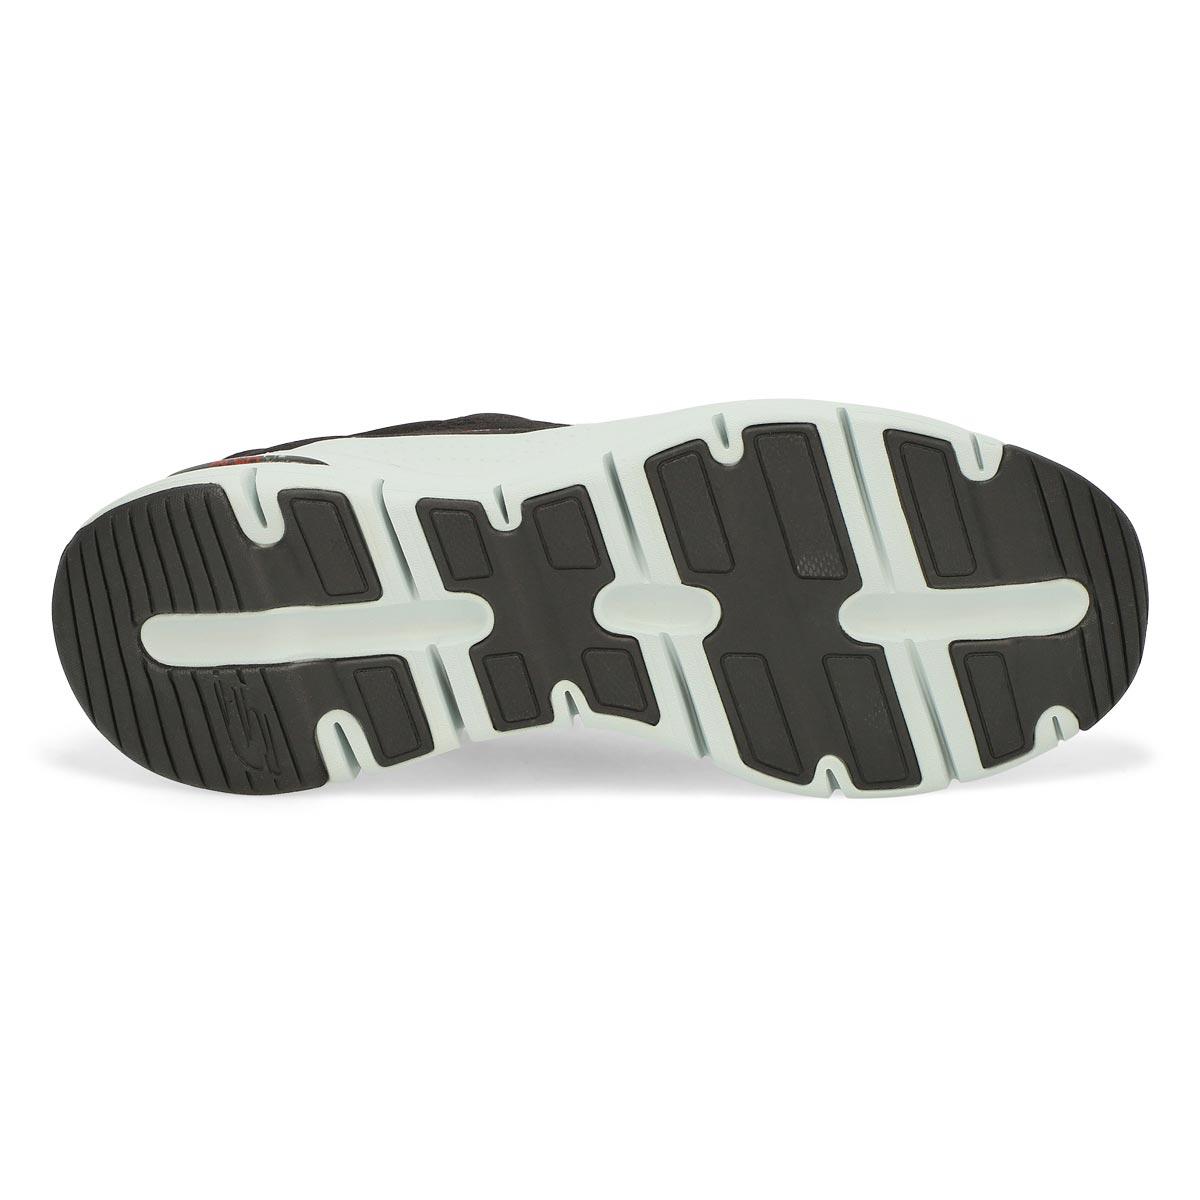 Men's Ultra Groove Sneakers - Black/Red